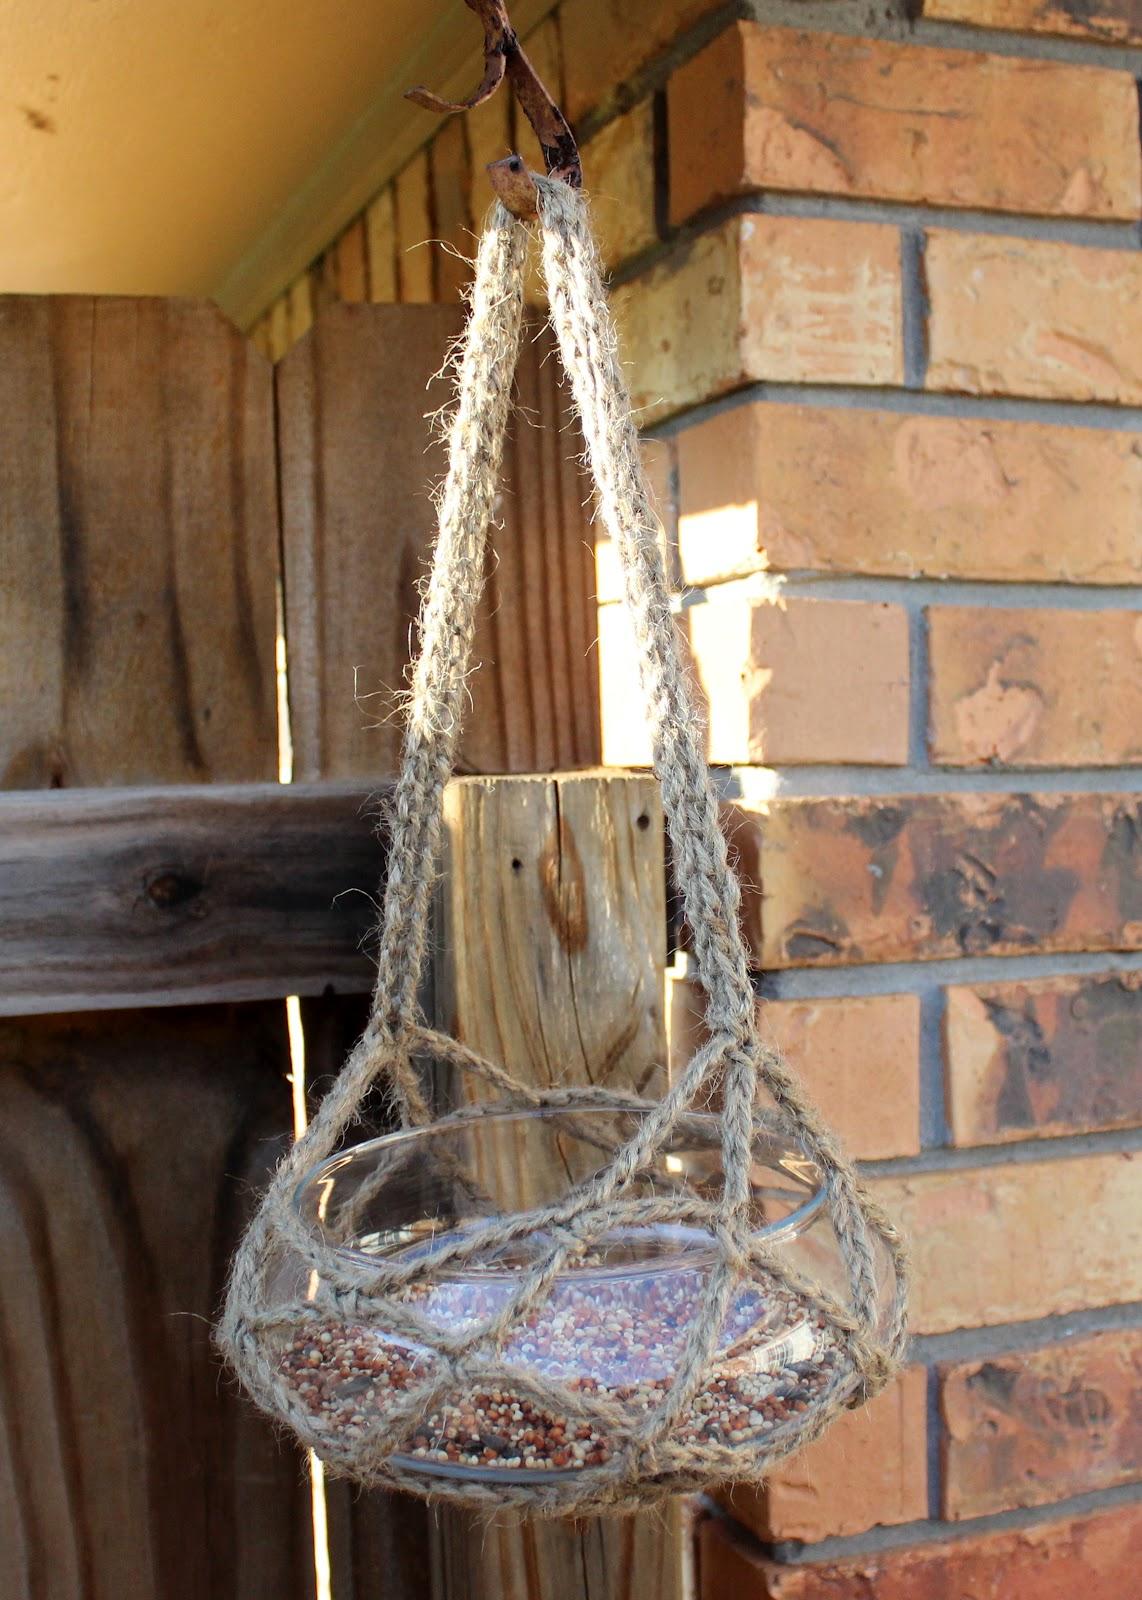 diy crocheted glass bird feeder